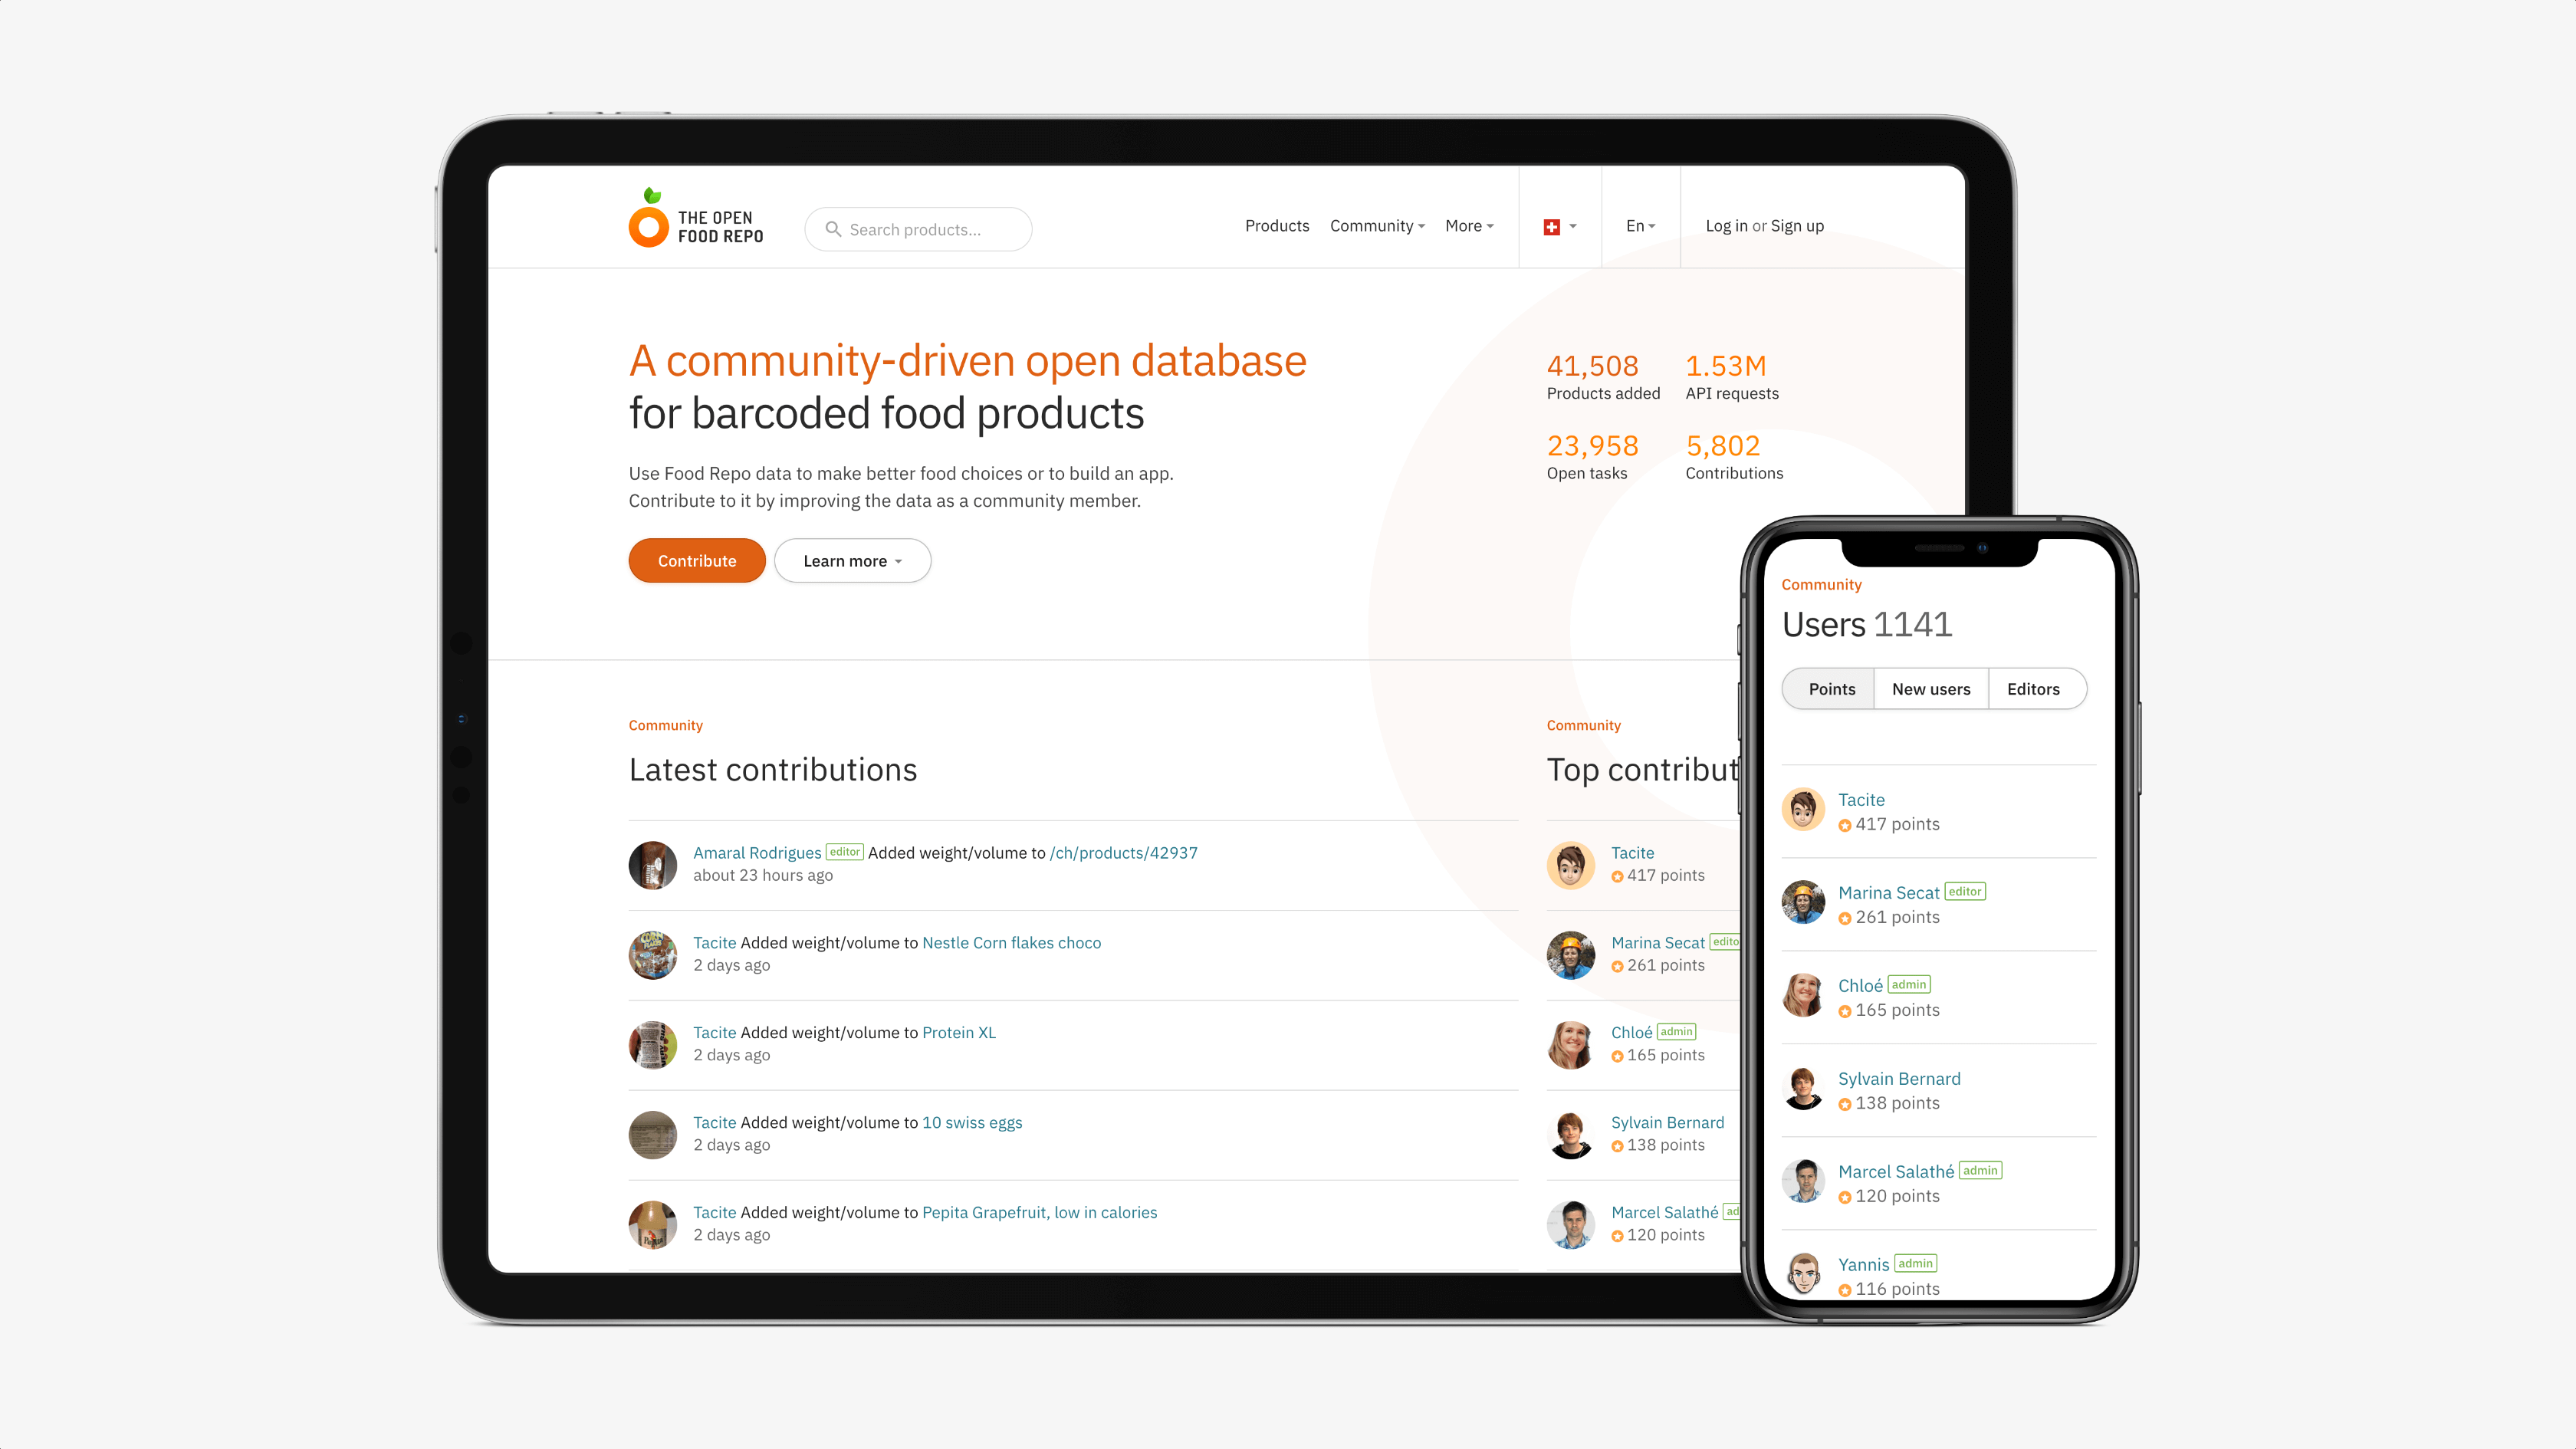 Screenshots of The Open Food Repo website